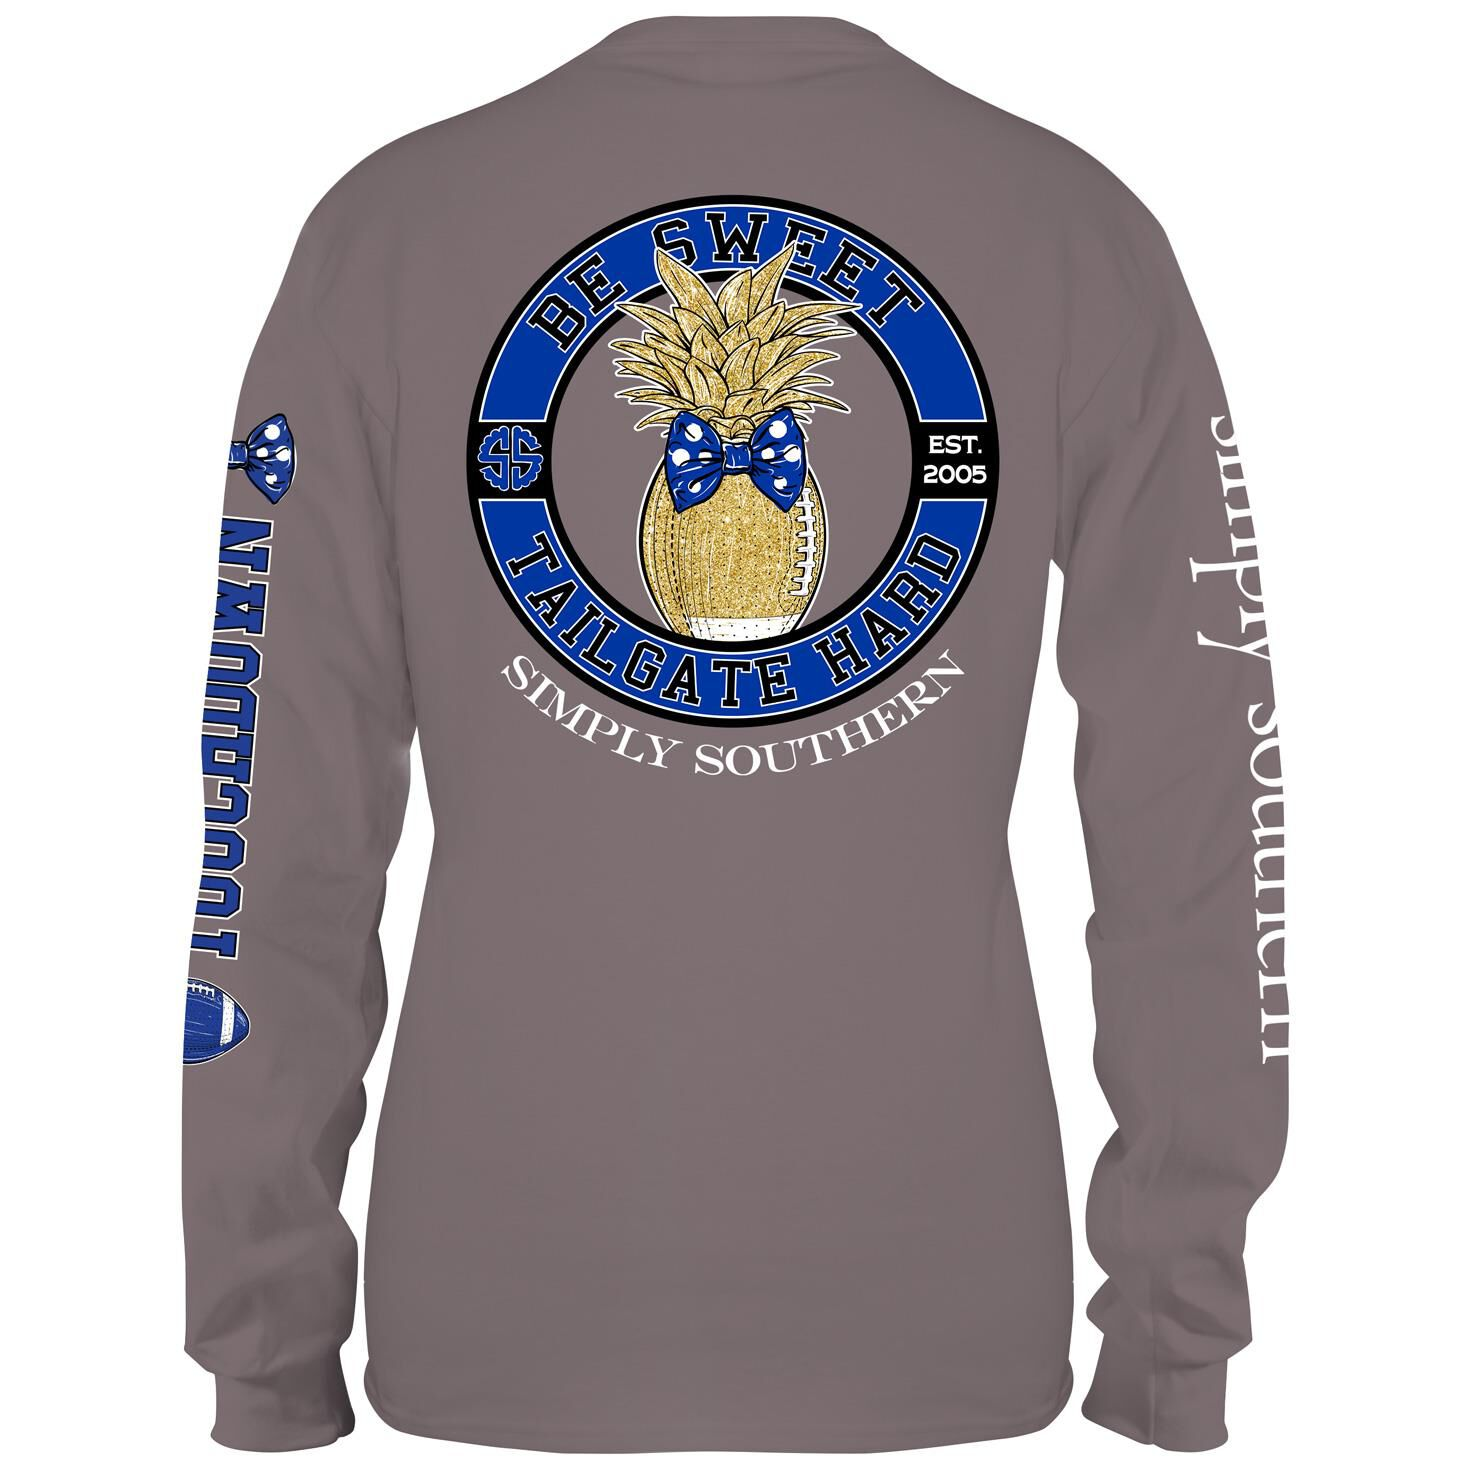 8fa510406f3 Womens Royal Blue Shirts - BCD Tofu House